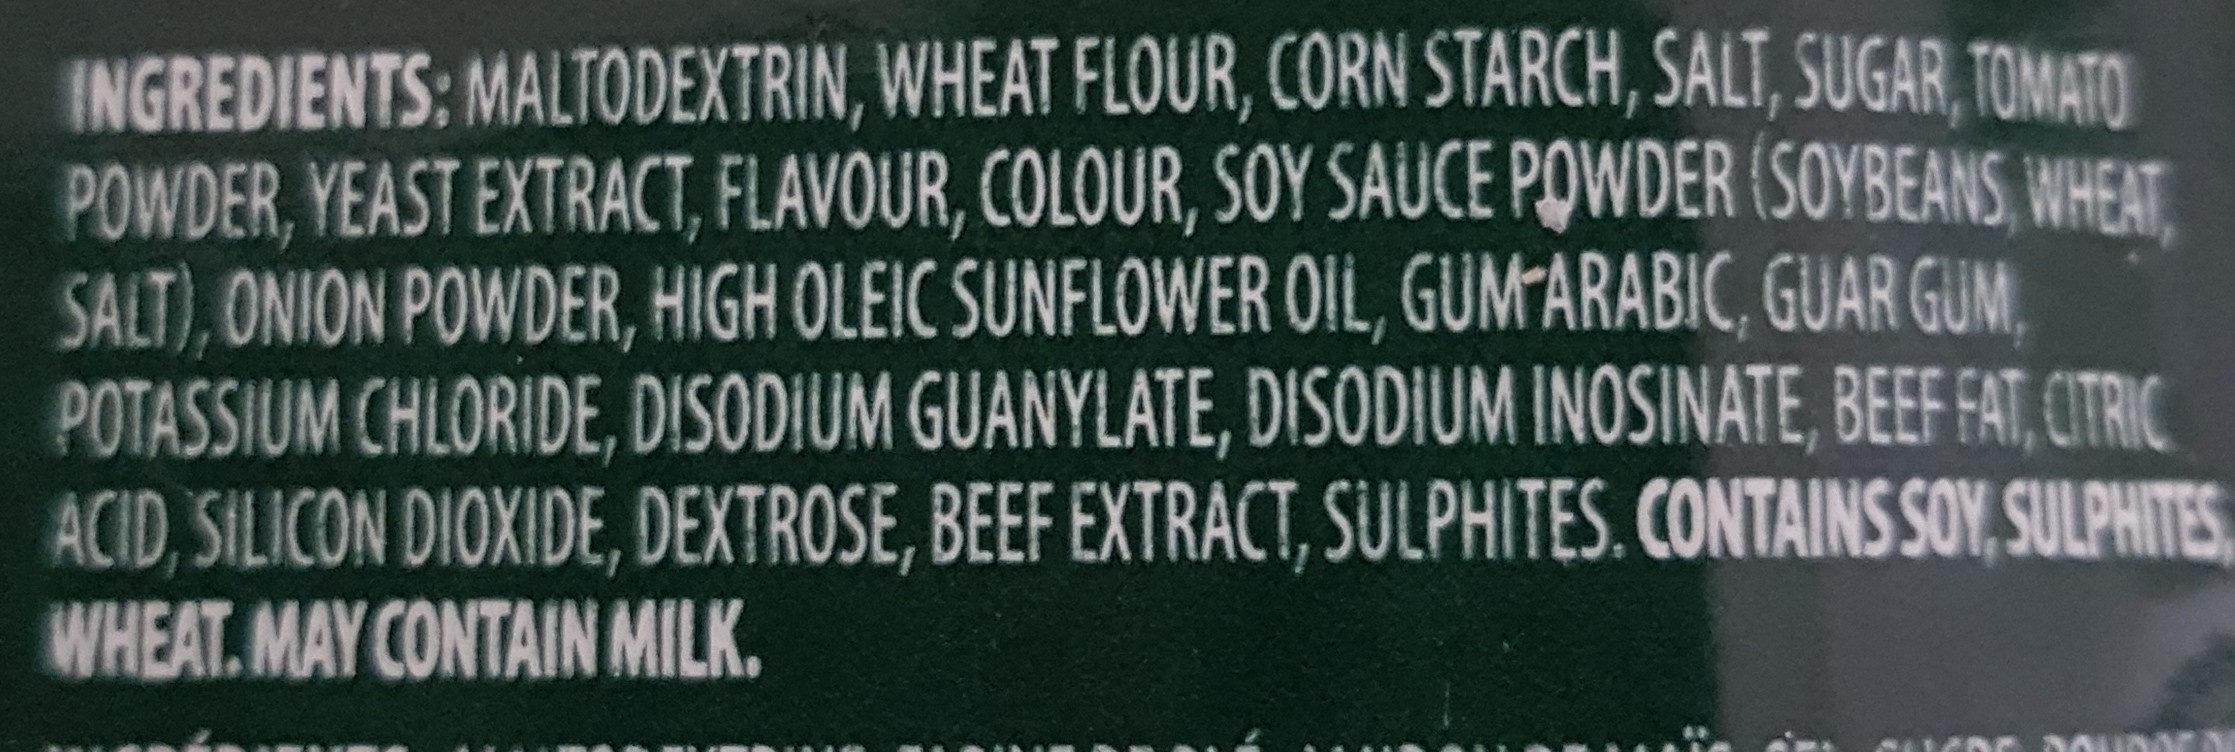 Demi-glace - Ingredients - fr